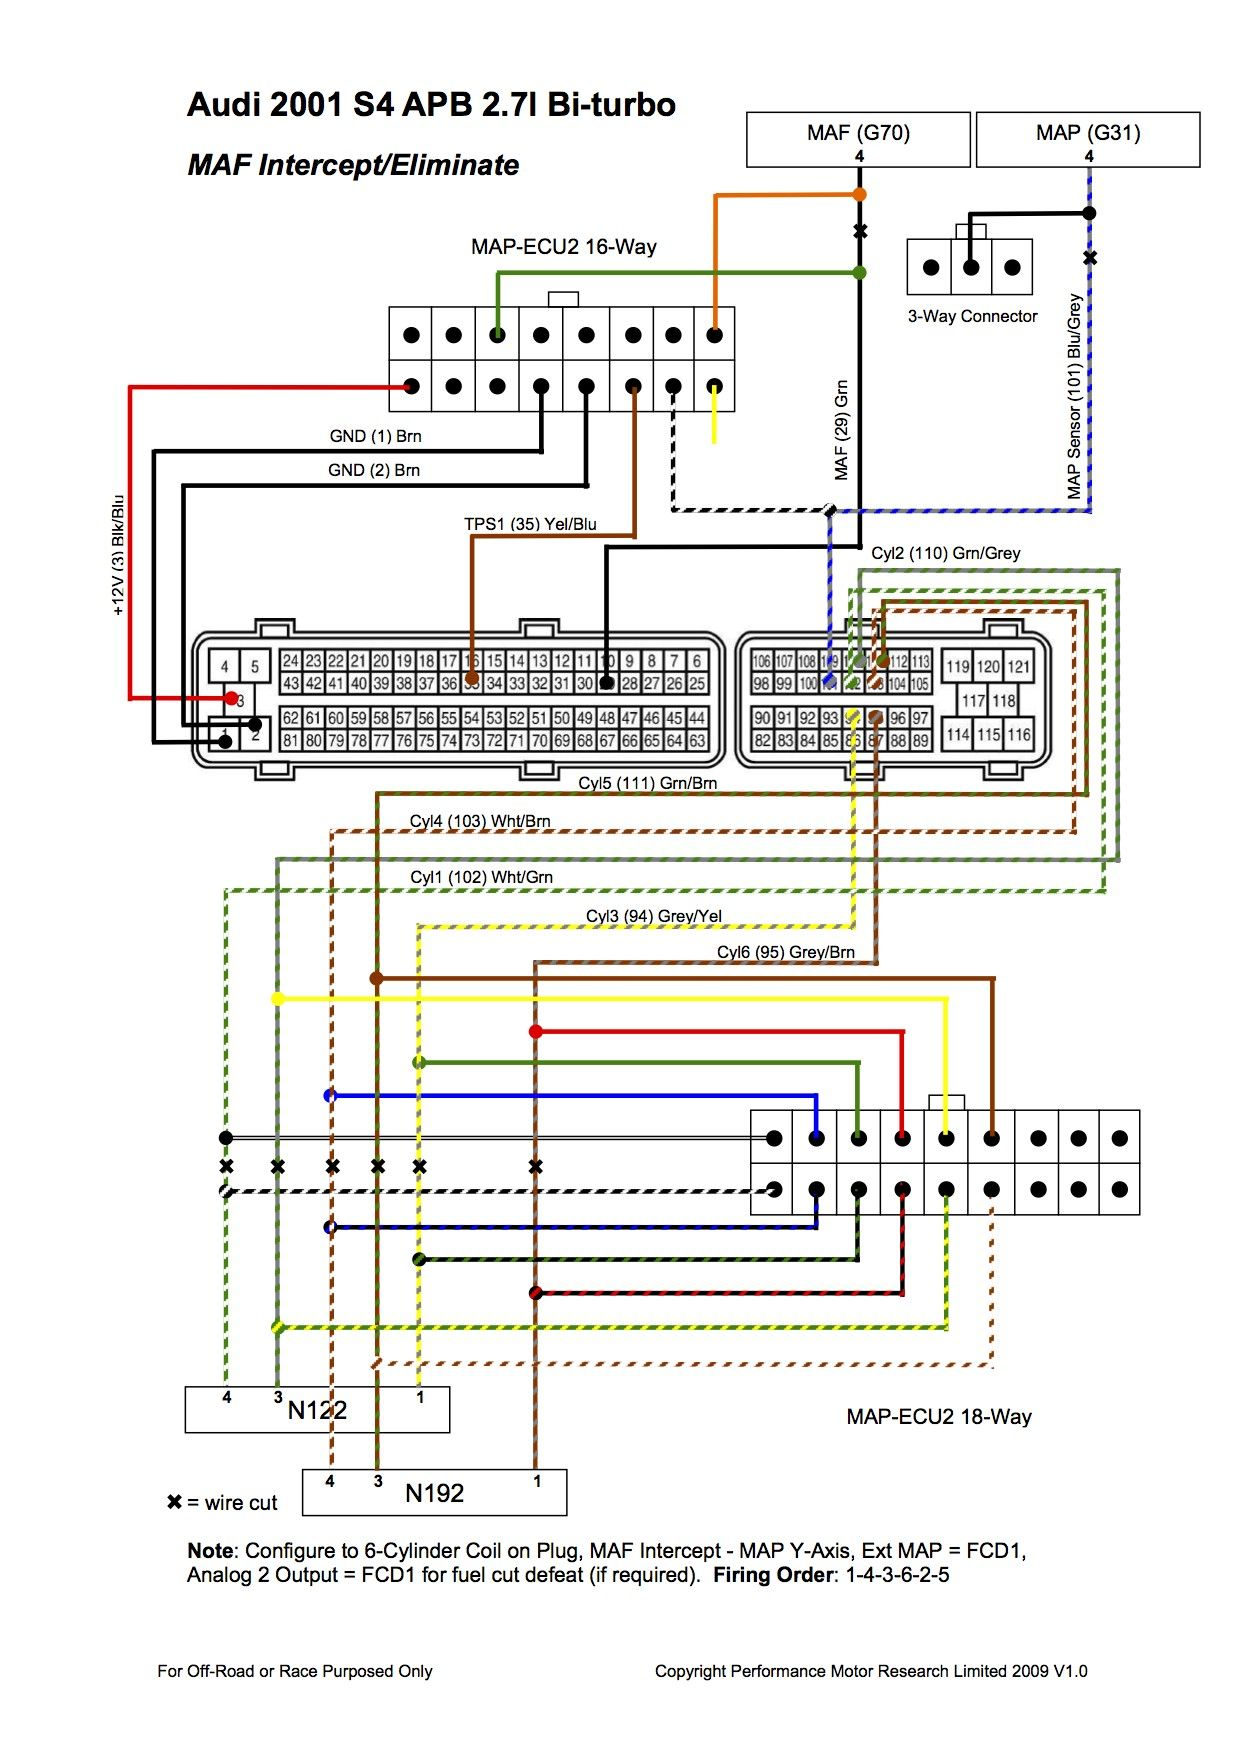 2004 Dodge Durango Wiring Diagram from i.pinimg.com